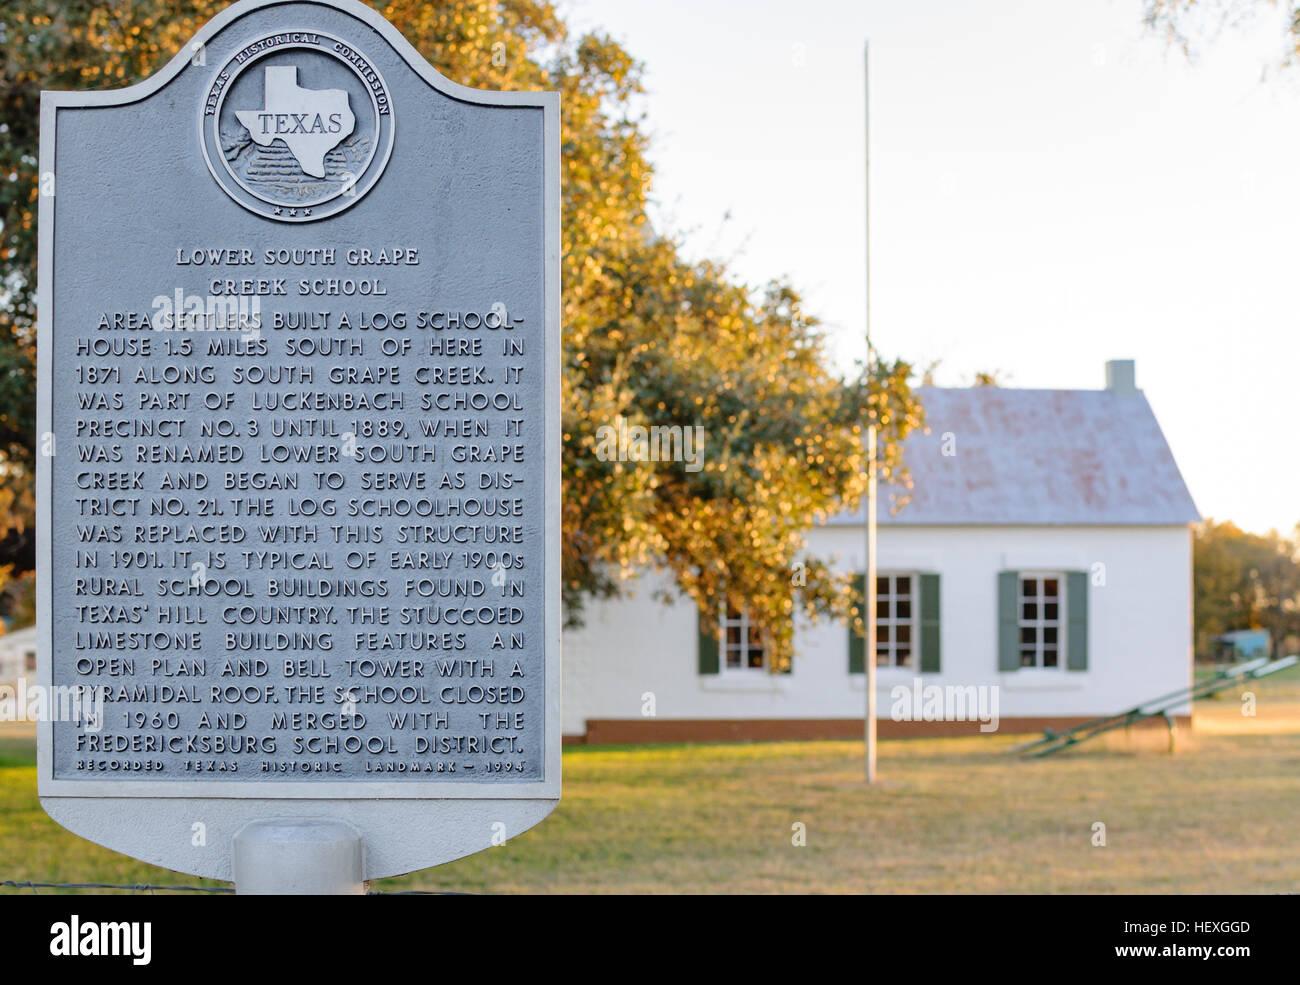 Historic marker for Lower South Grape Creek School, Fredericksburg, Texas, USA - Stock Image